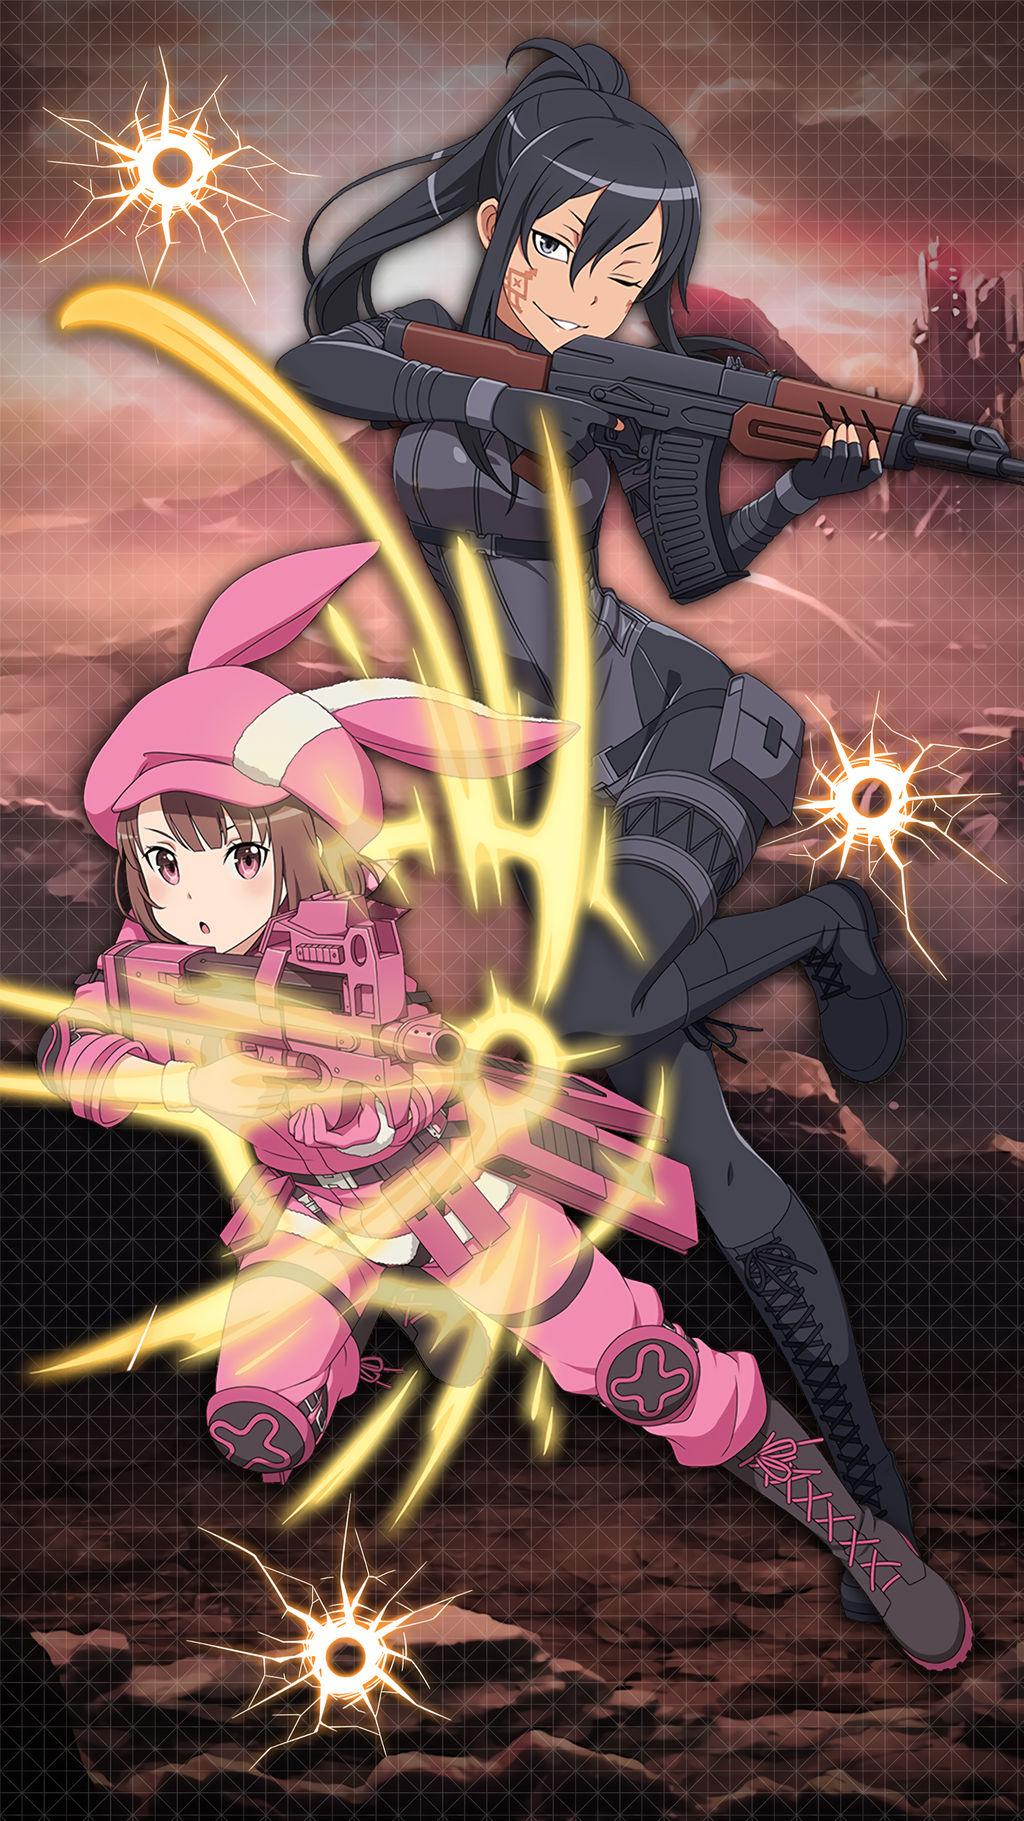 Gun Gale Online Alternative Mobile Wallpaper Sao By Kaz Kirigiri